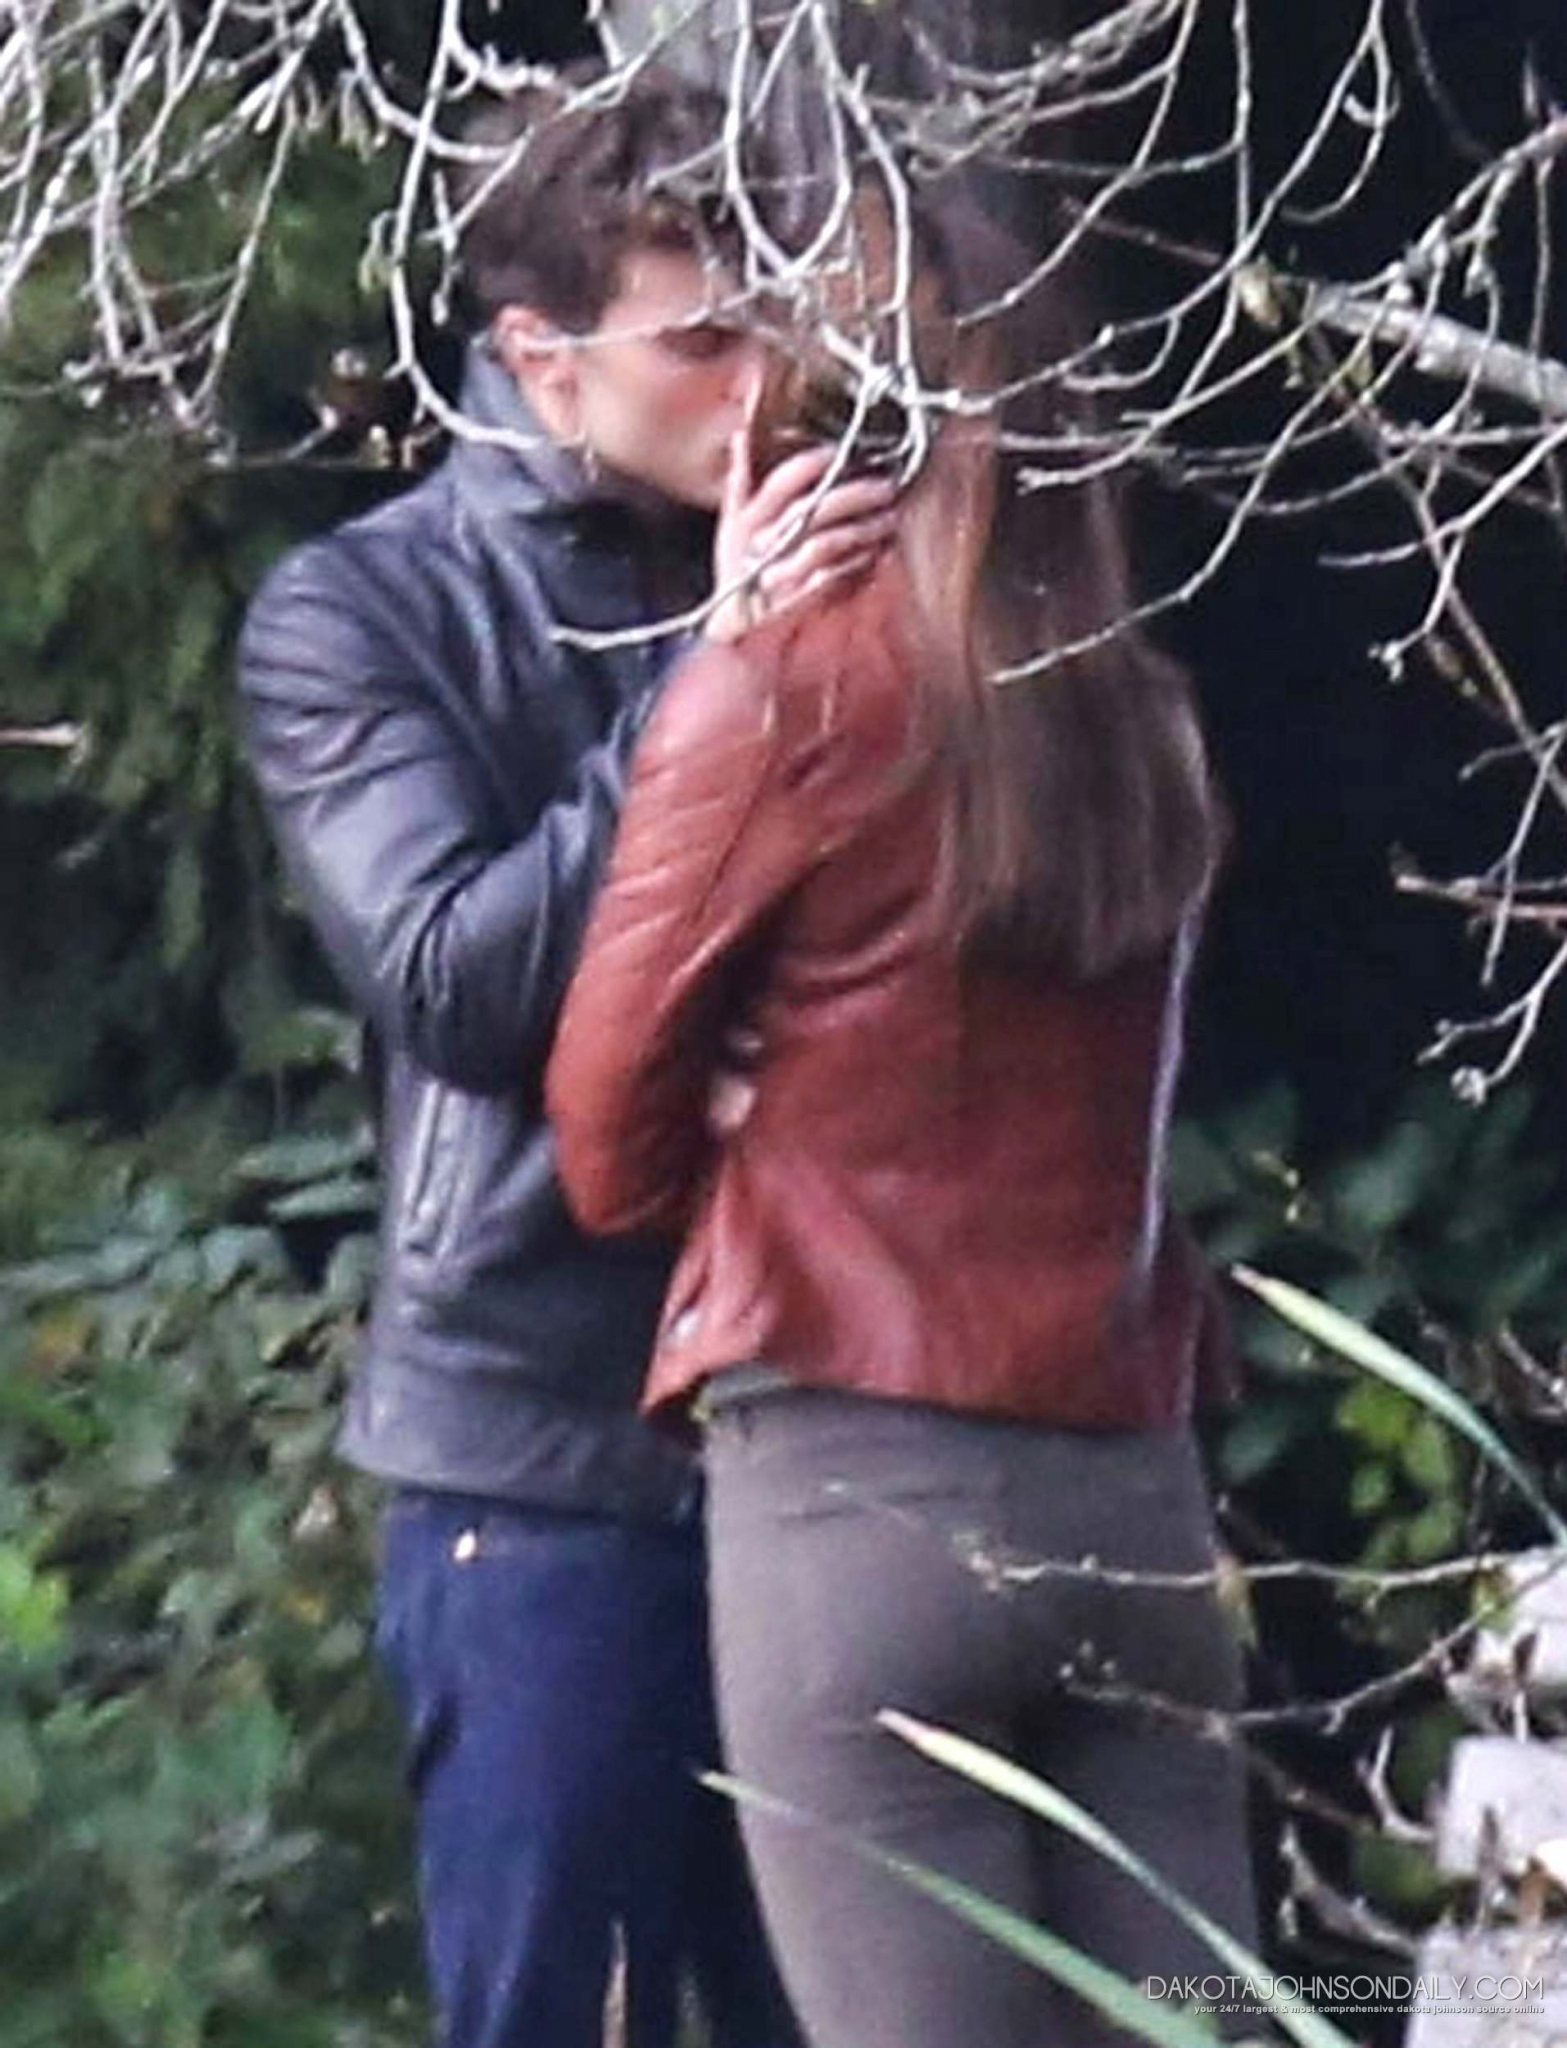 Dakota Johnson and Jamie Dornan Shared Kiss On The Set of Fifty Shades of Grey